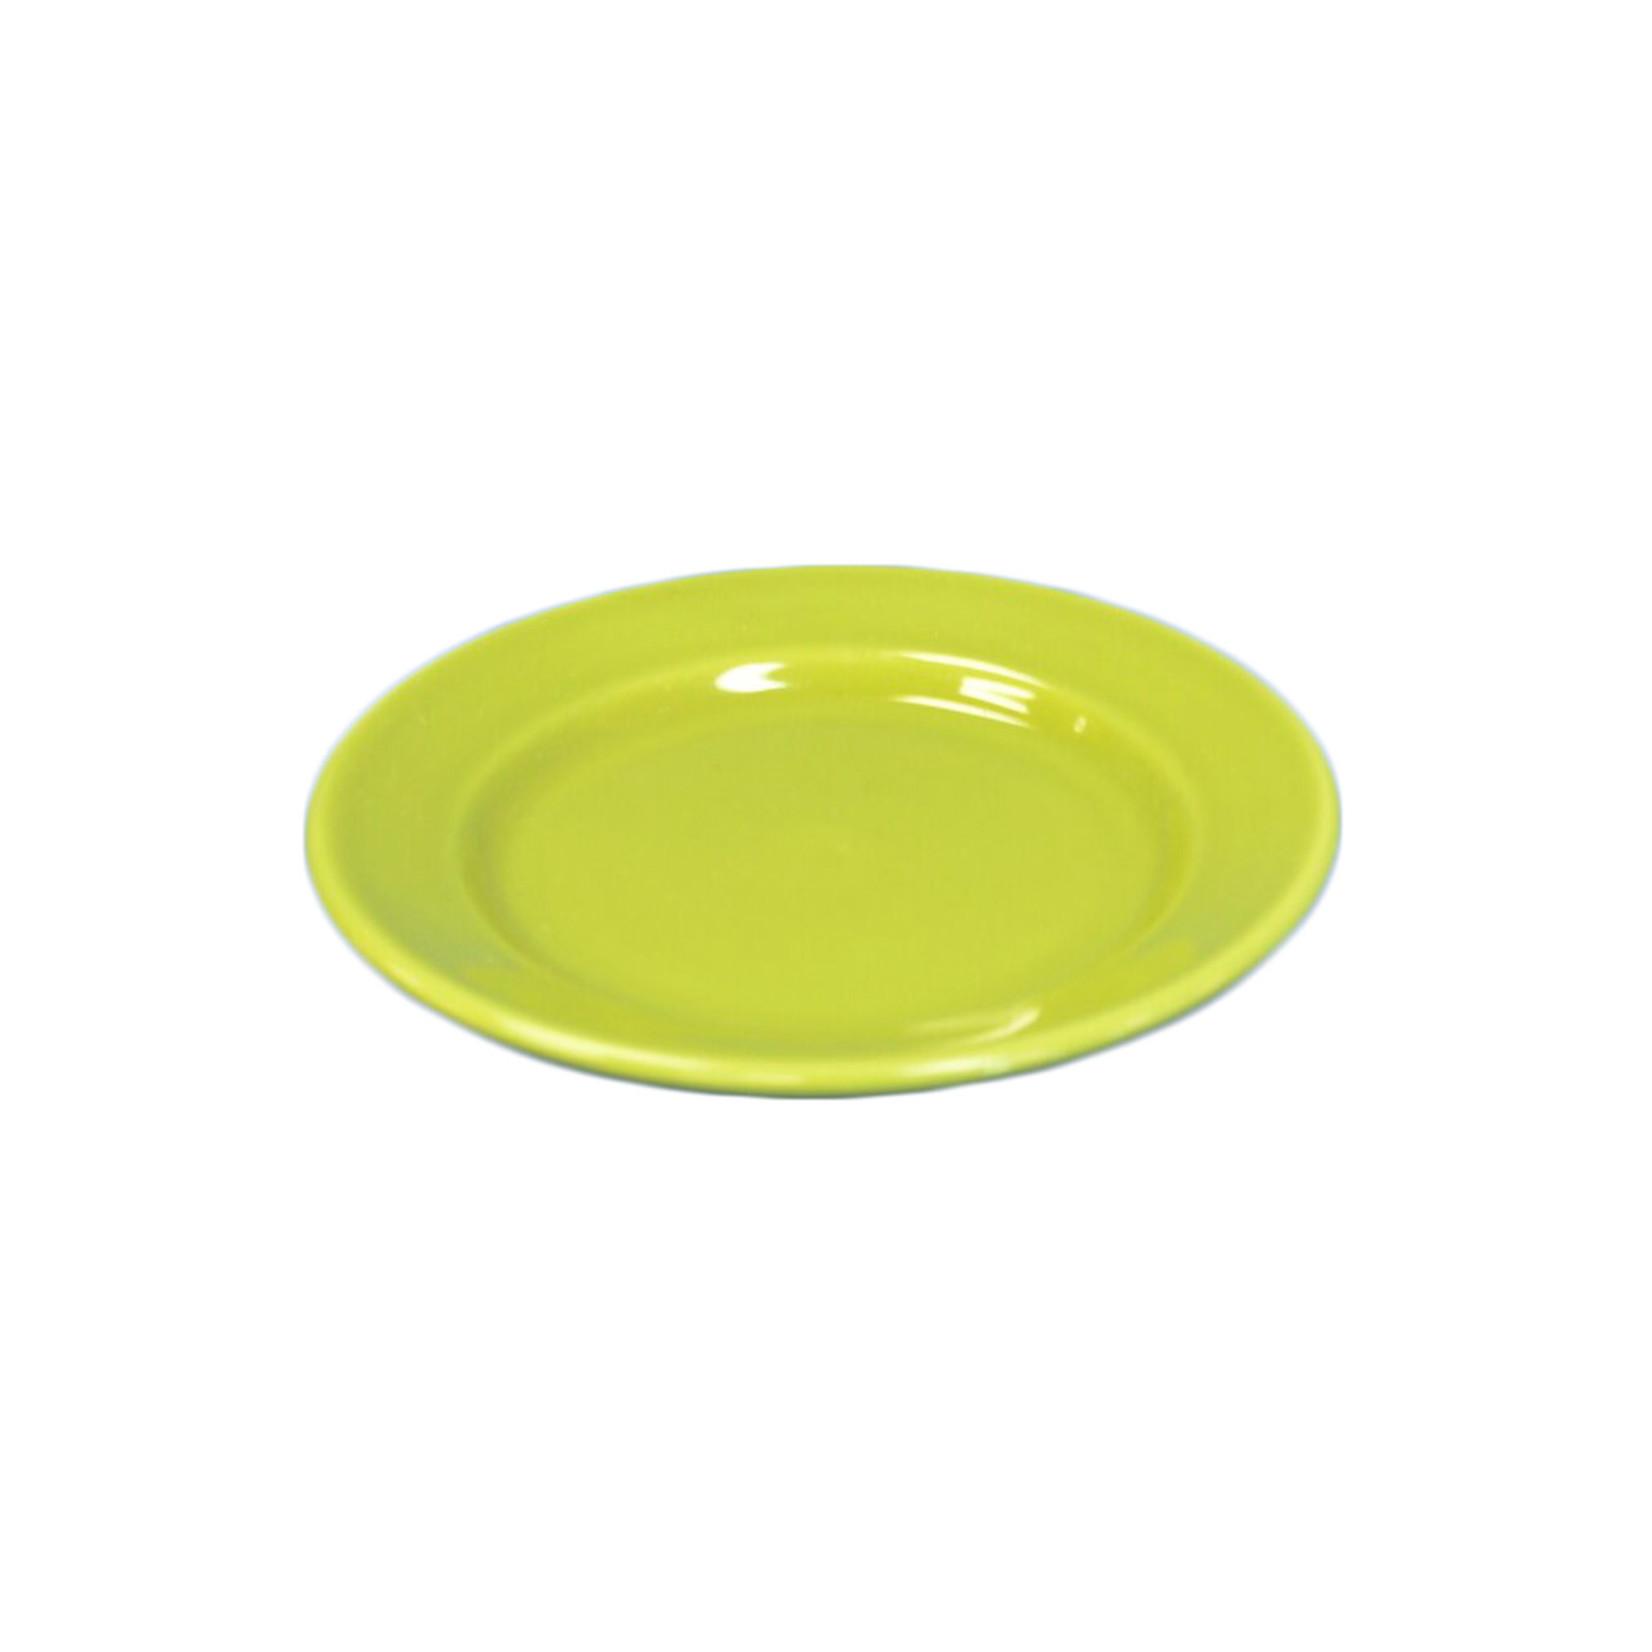 Green Ceramic Small Plate